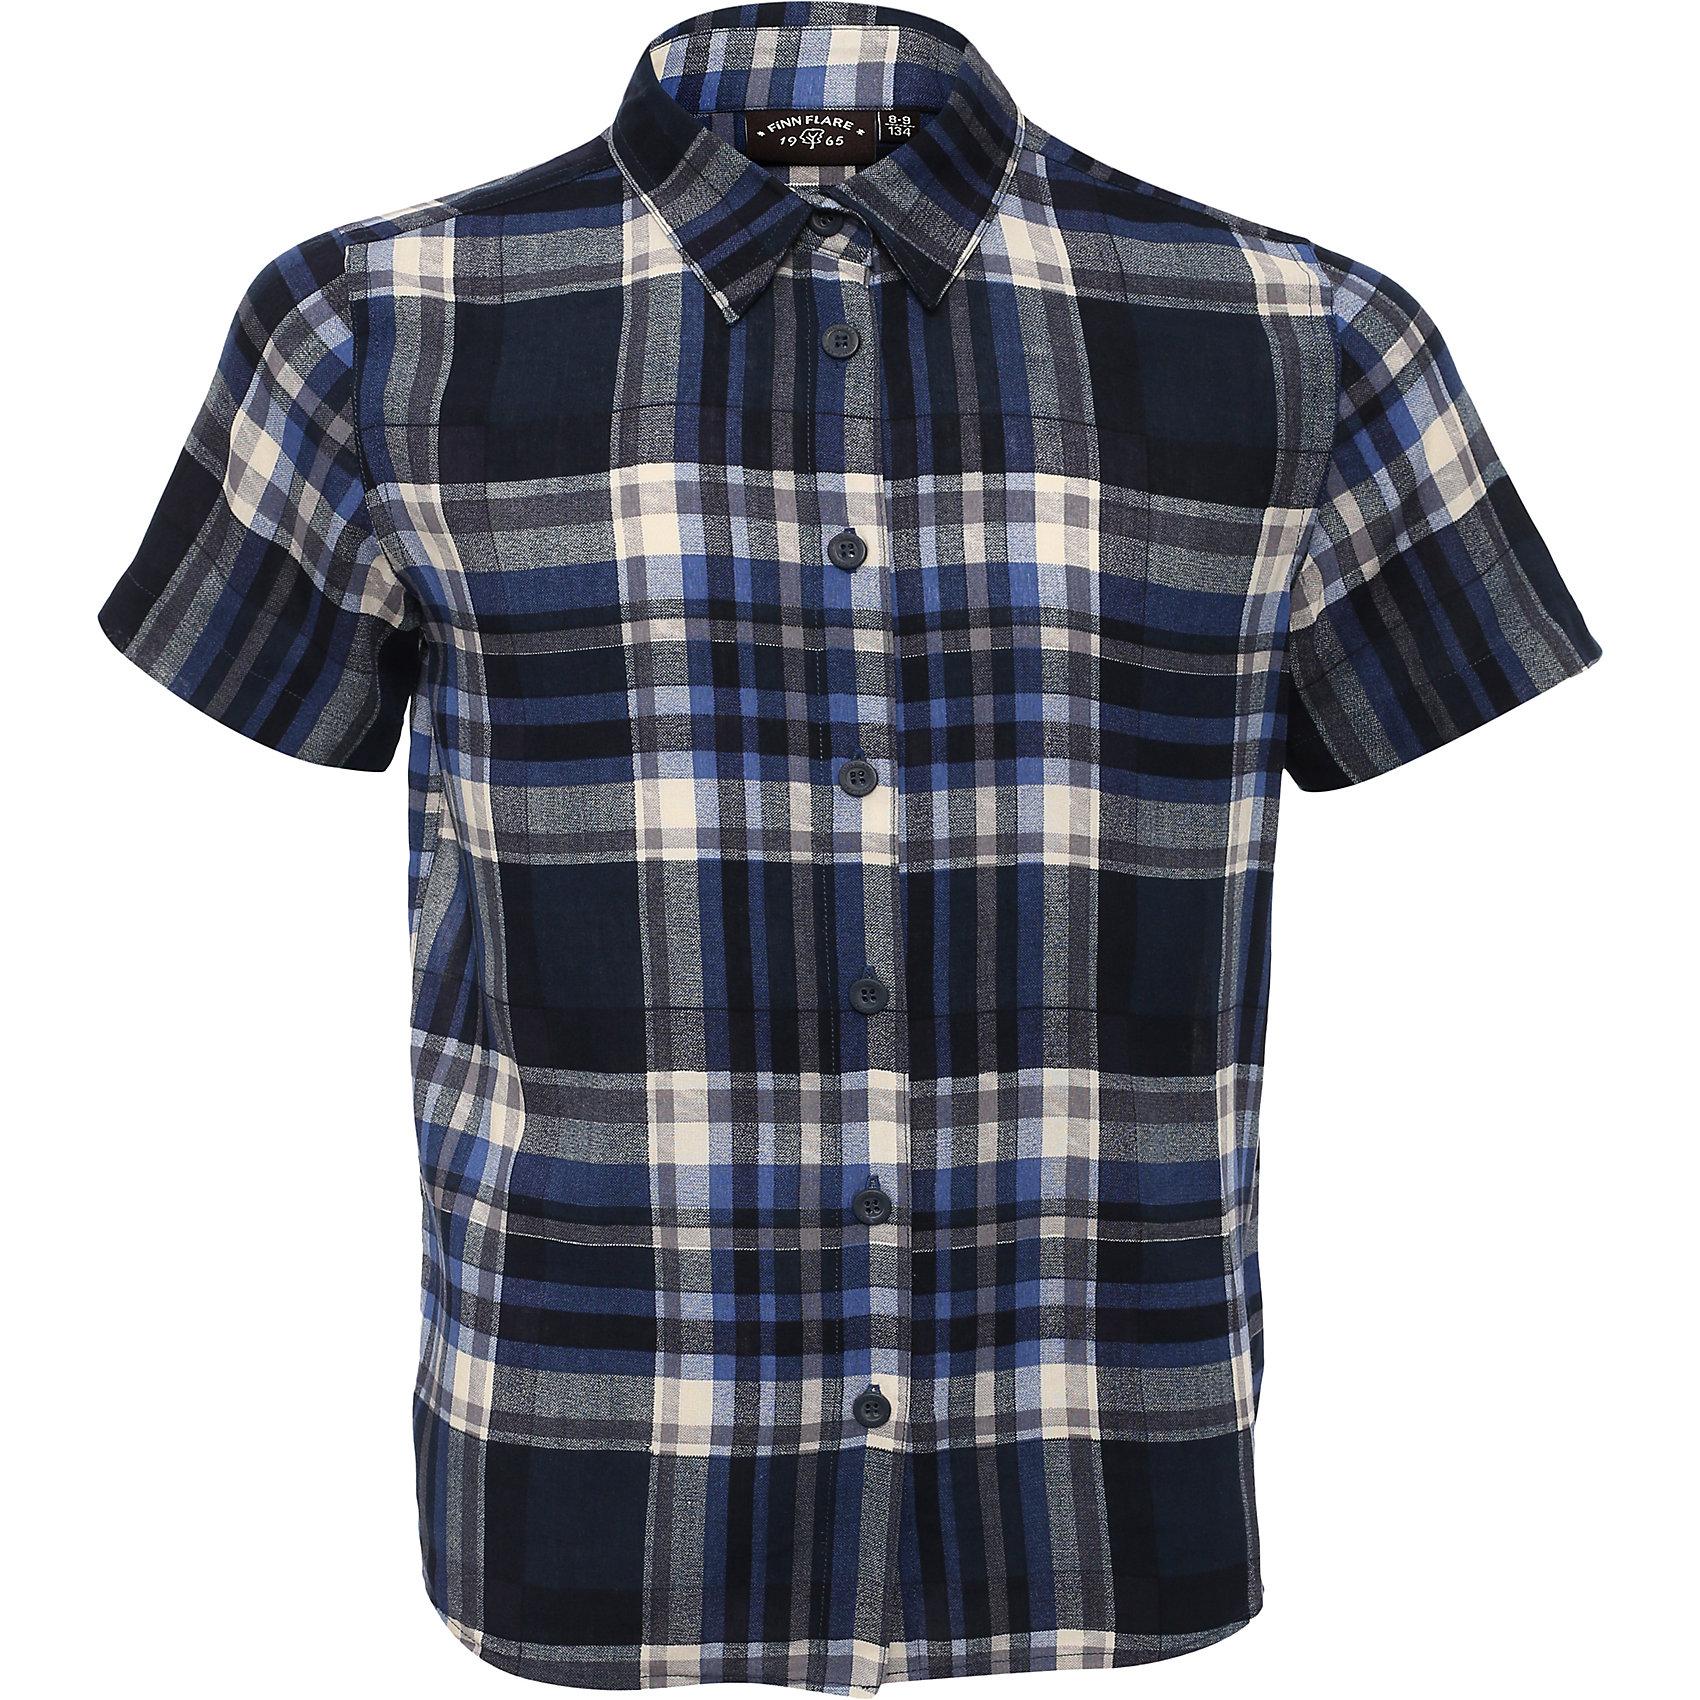 Рубашка для мальчика Finn FlareРубашка для мальчика от известного бренда Finn Flare<br>Фактура материала:Текстильный<br>Вид застежки:Пуговицы<br> Длина рукава:Короткие<br> Тип карманов:Без карманов<br>Состав:<br>100% вискоза<br><br>Ширина мм: 174<br>Глубина мм: 10<br>Высота мм: 169<br>Вес г: 157<br>Цвет: полуночно-синий<br>Возраст от месяцев: 72<br>Возраст до месяцев: 84<br>Пол: Мужской<br>Возраст: Детский<br>Размер: 134,122,110,158,146<br>SKU: 4835660